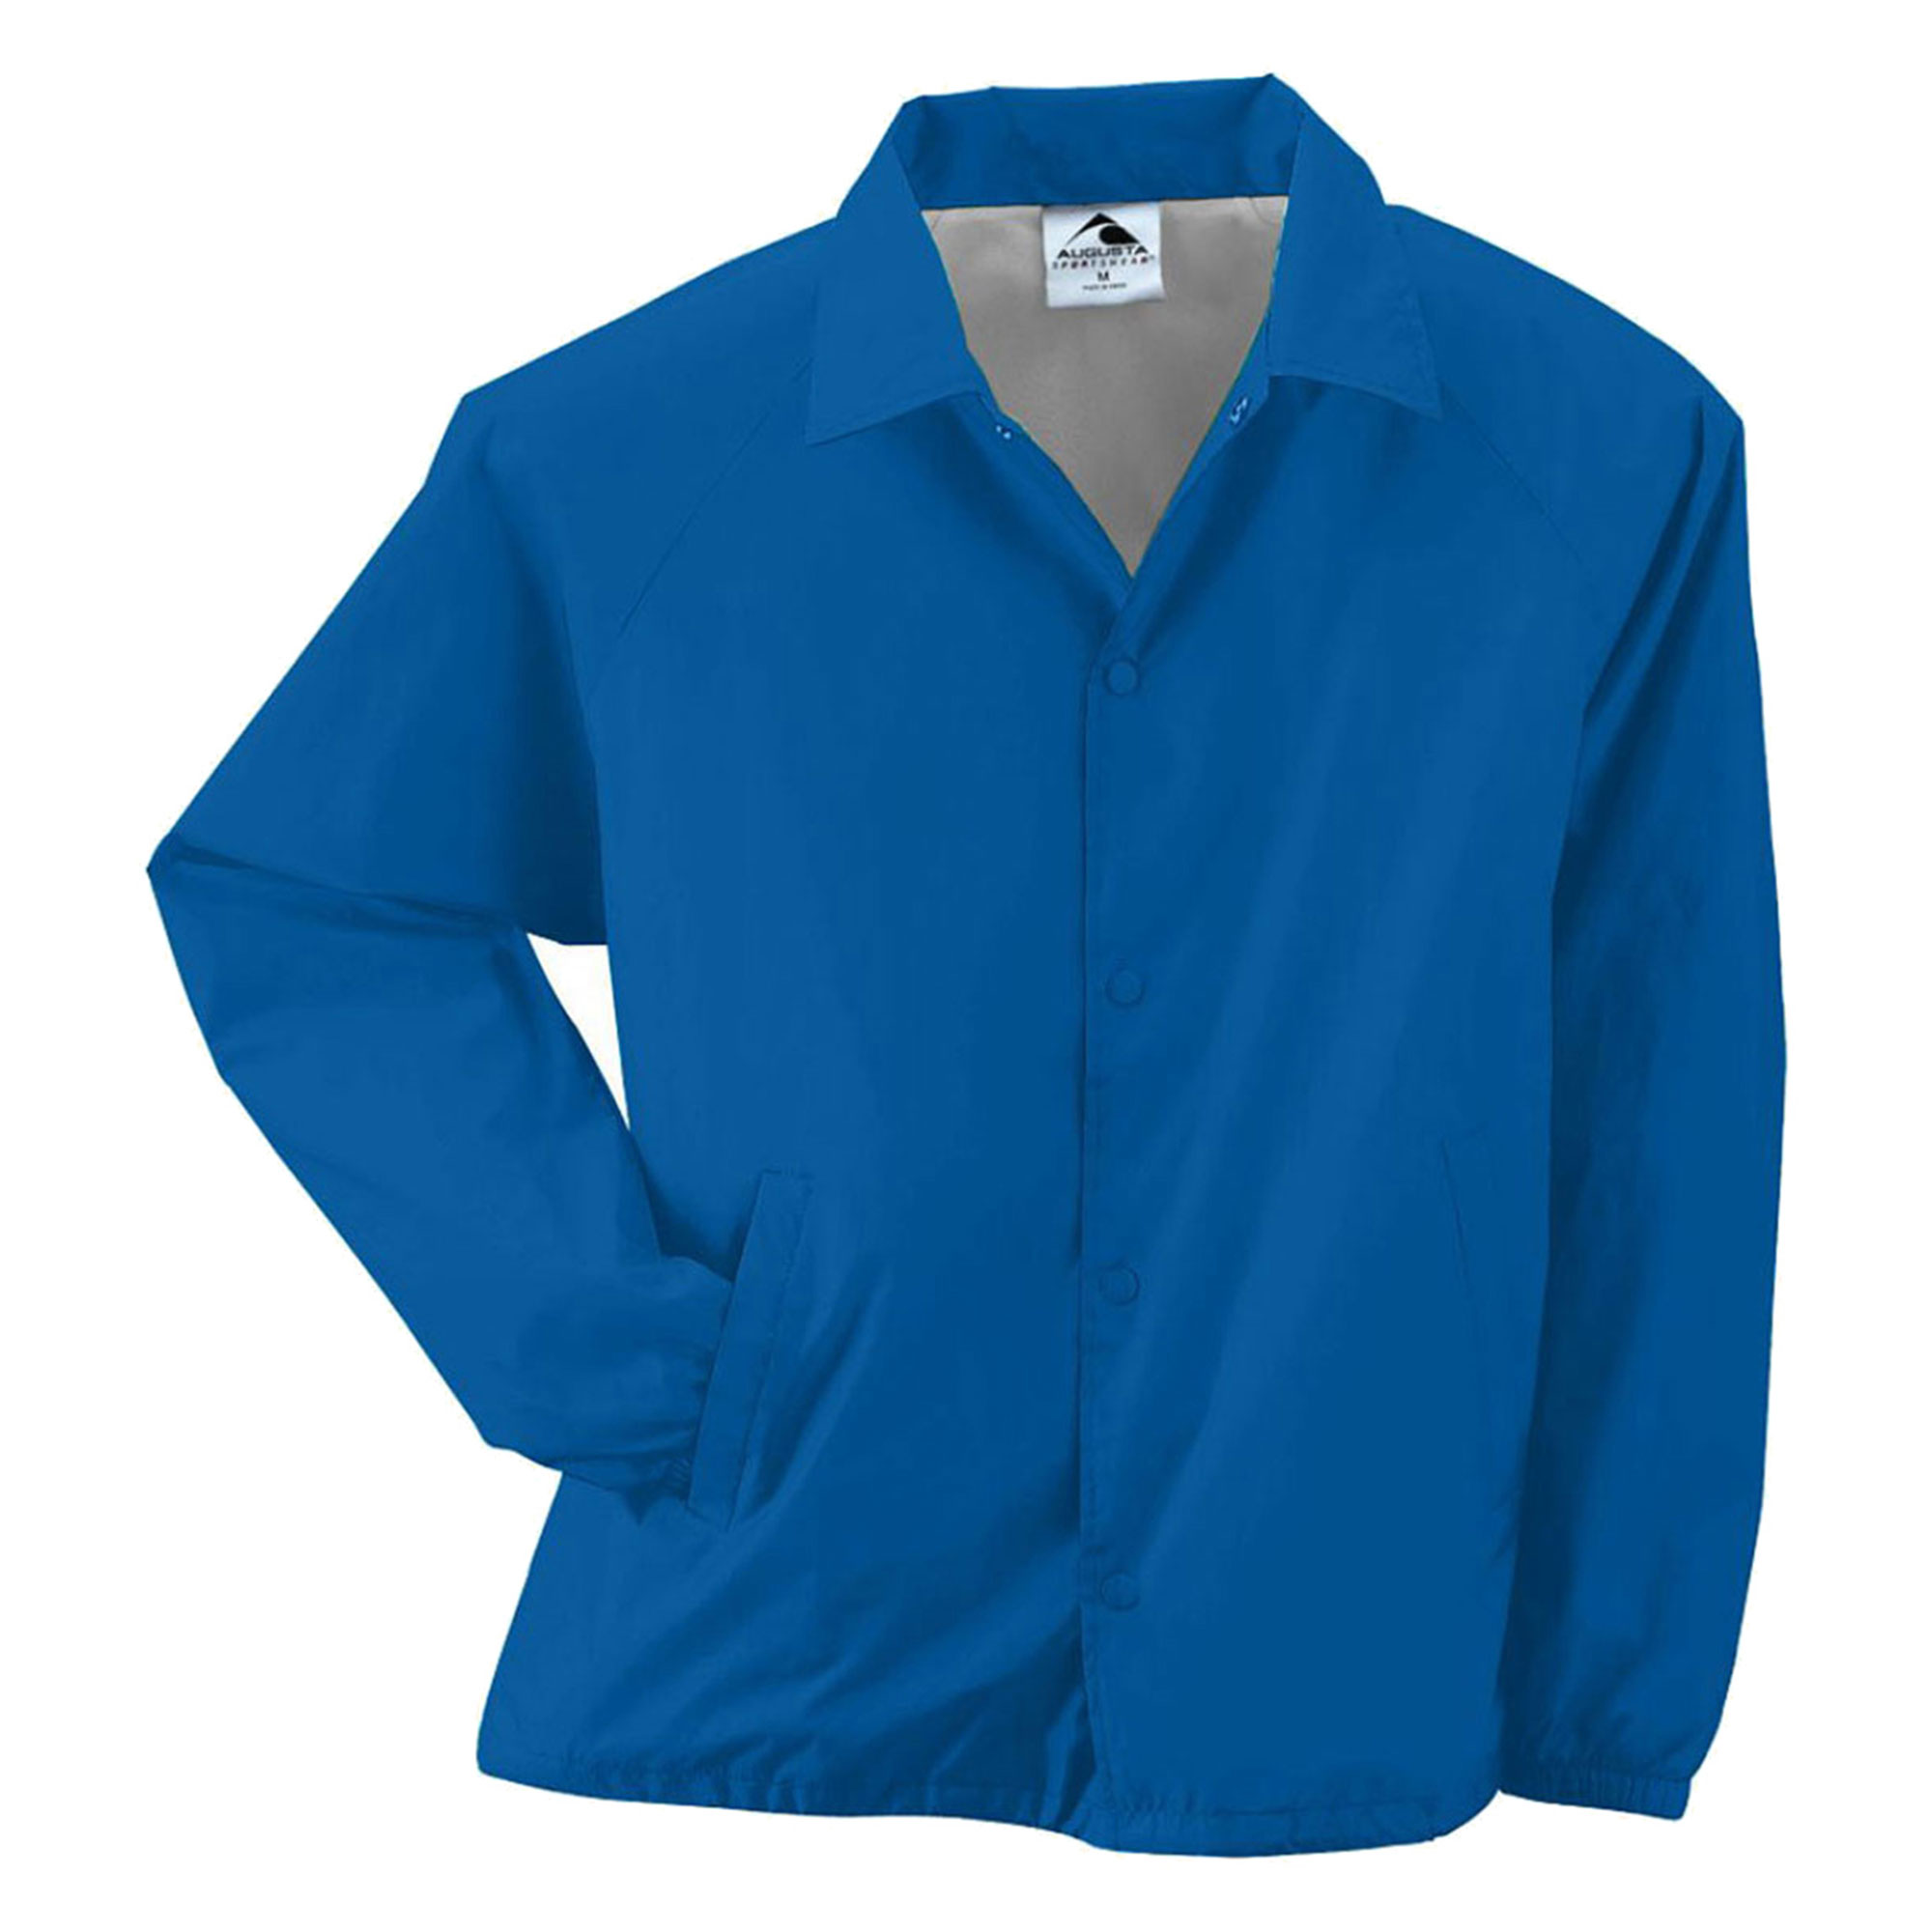 Augusta Sportswear Mens Brushed Tricot Jacket, Royal, 3XL...